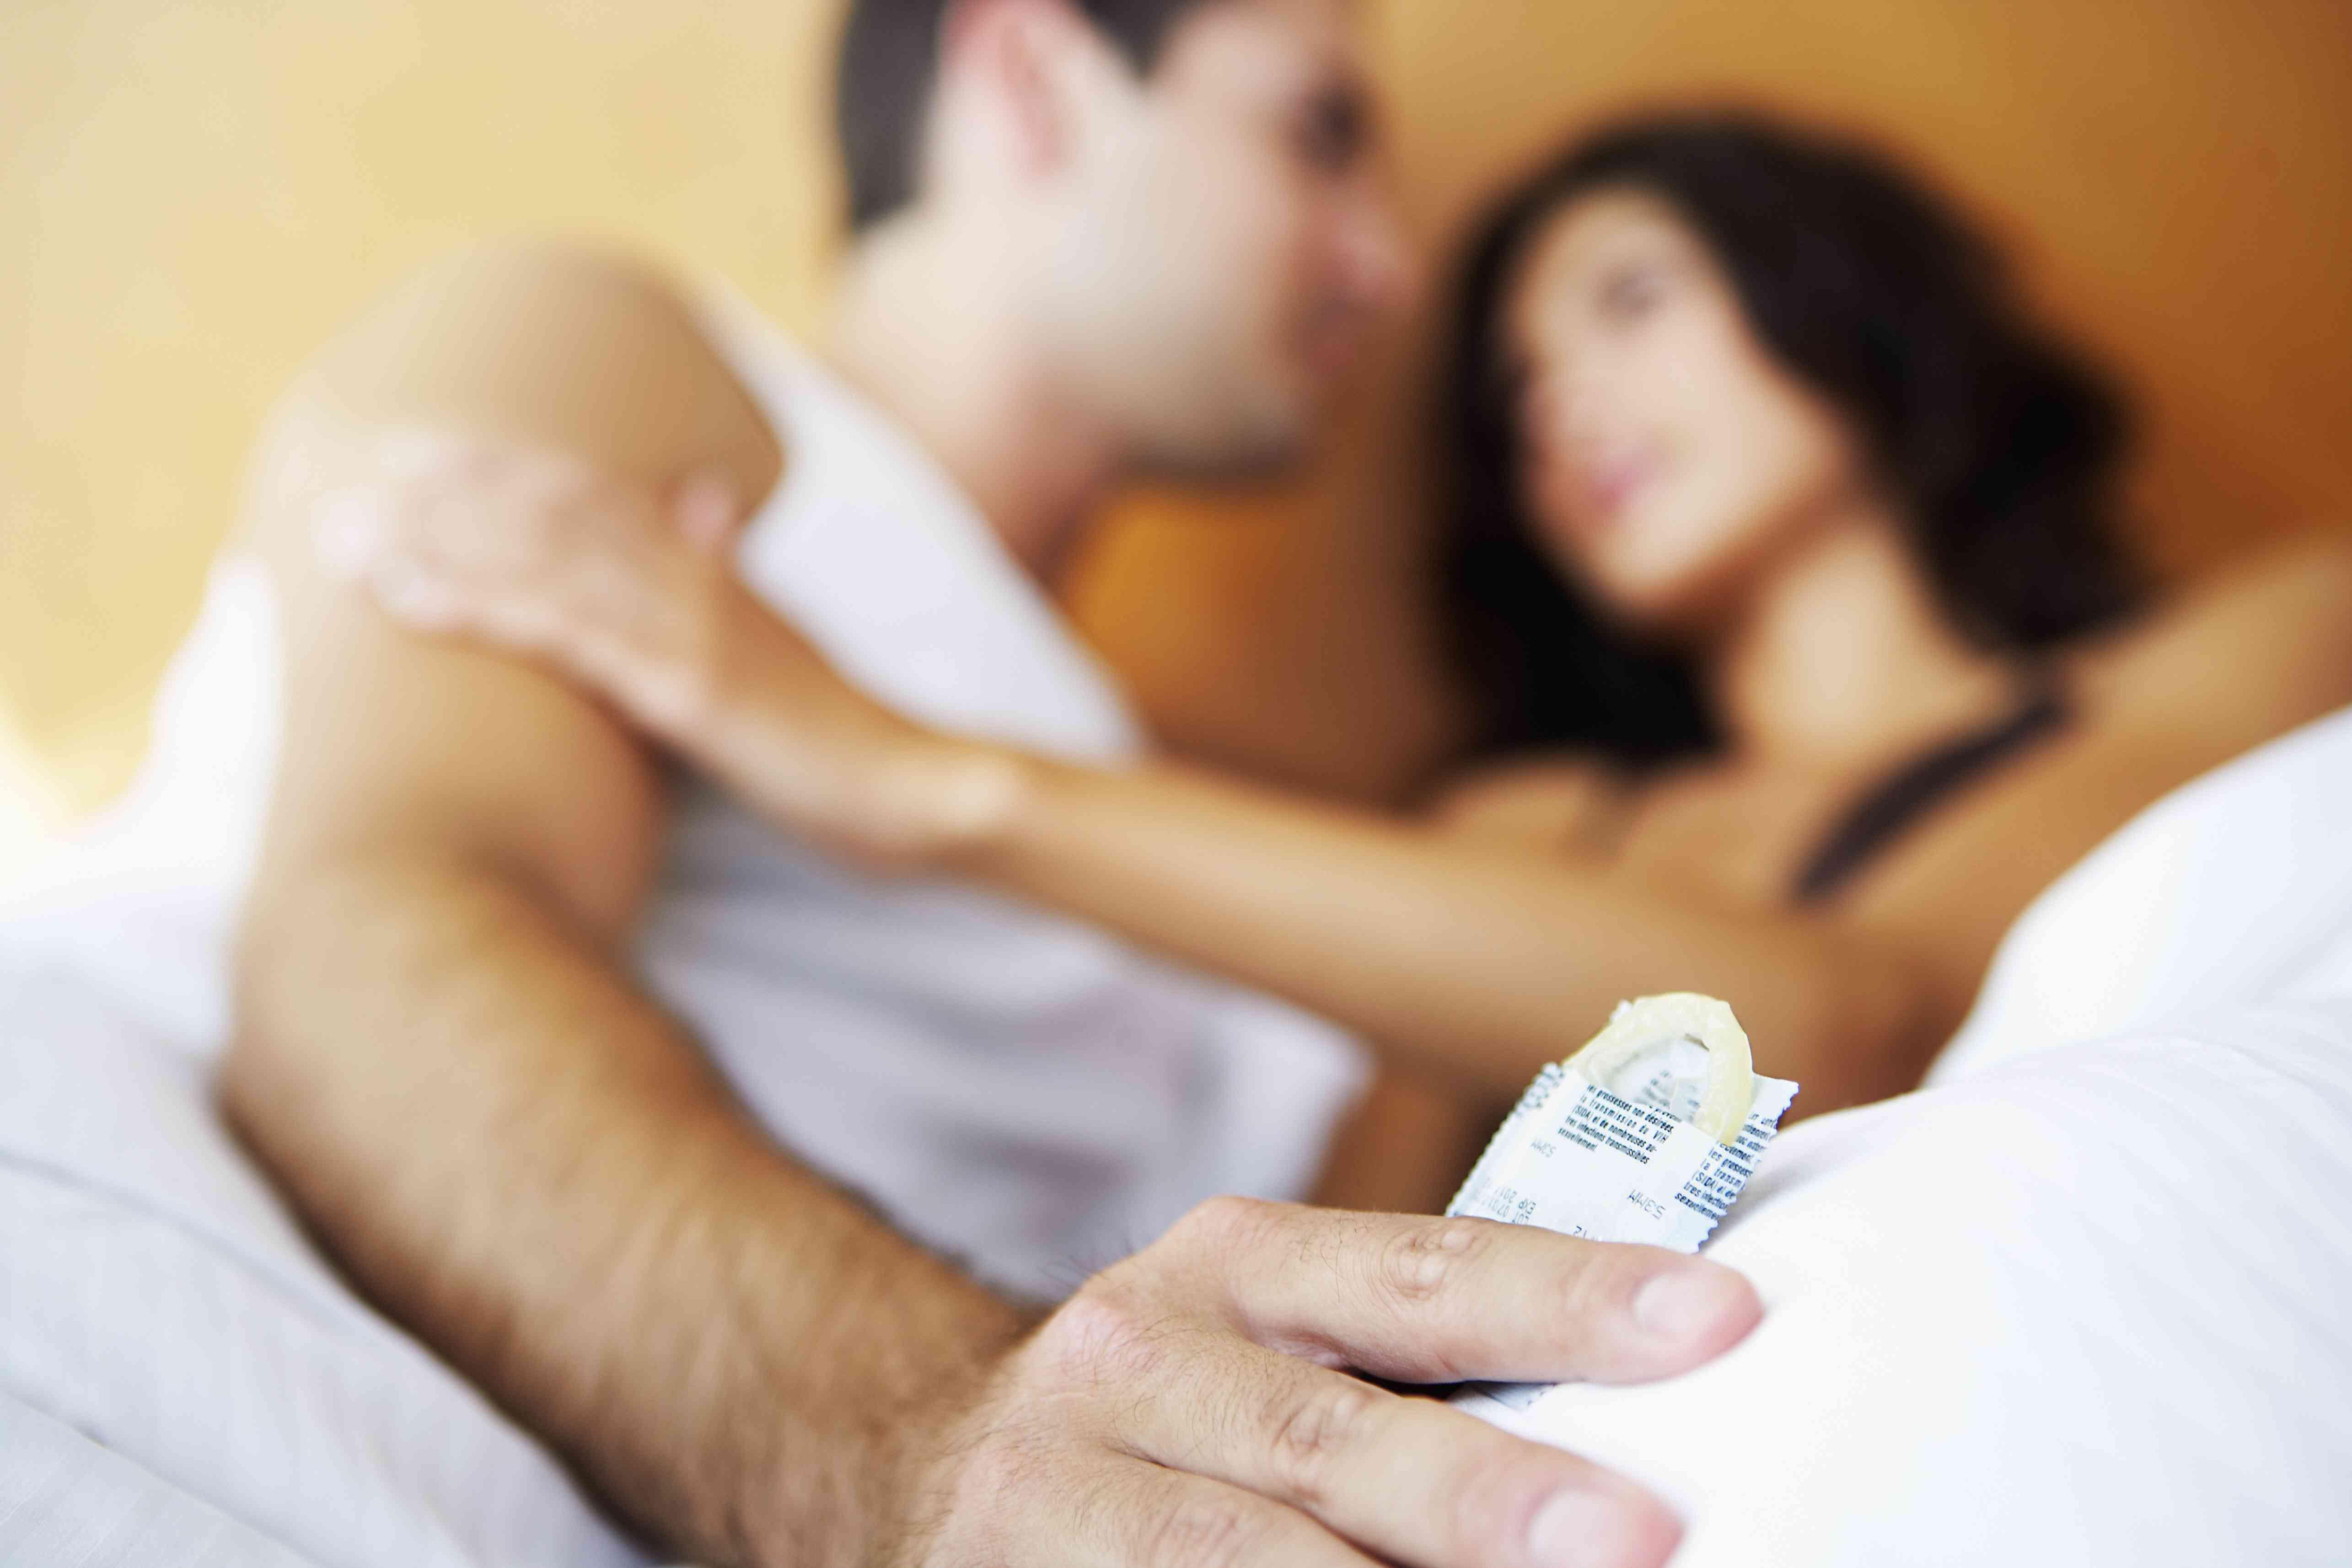 seks-s-prezervativom-smotret-onlayn-video-paren-bog-kunilingusa-video